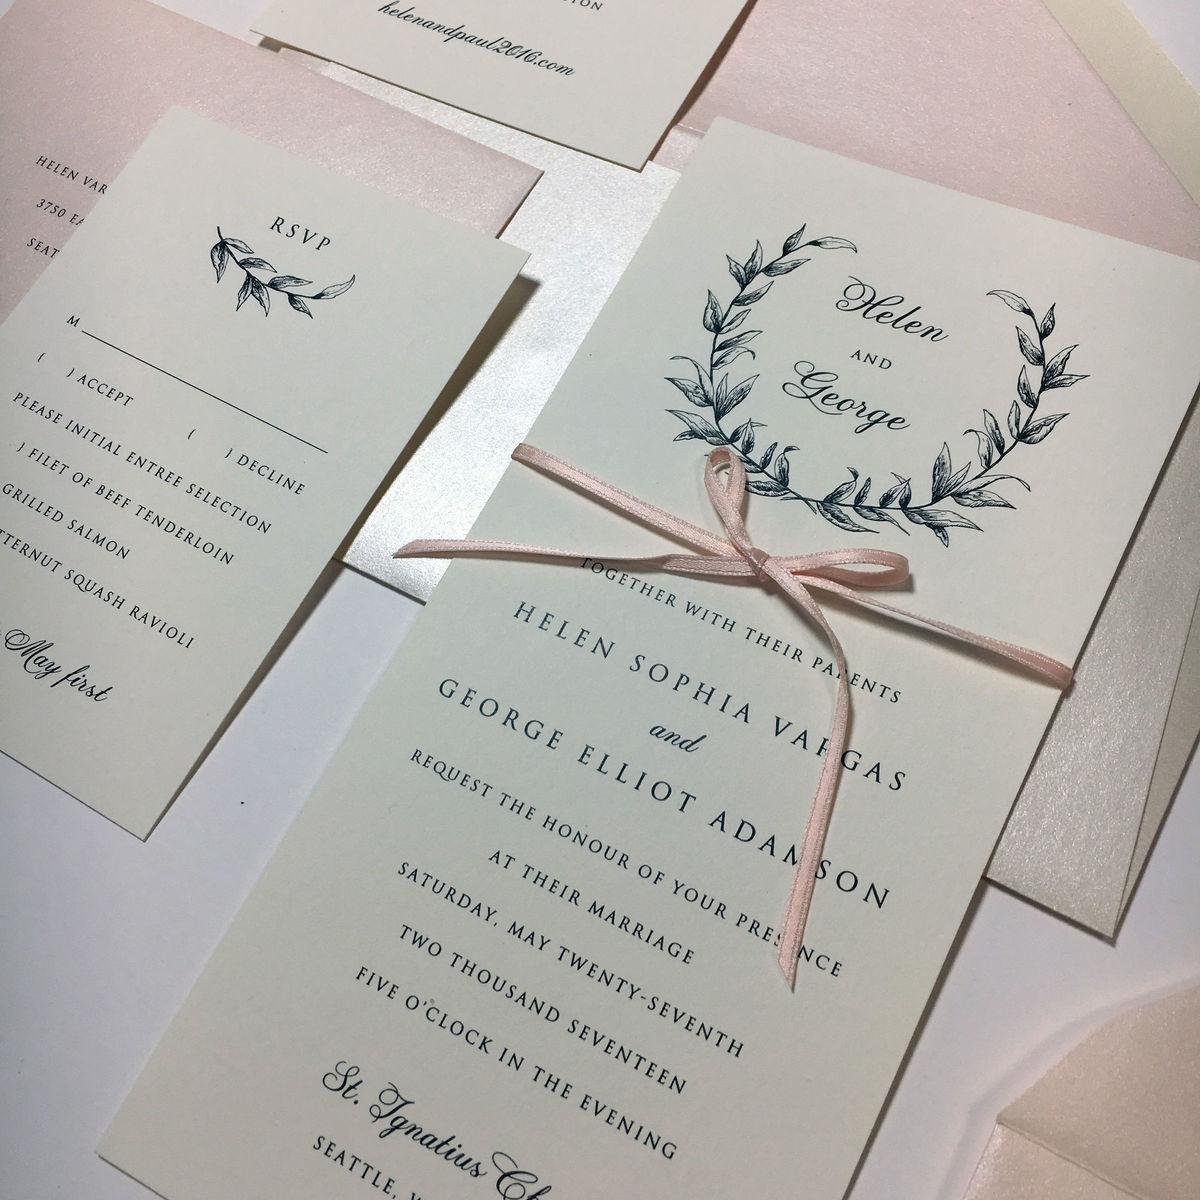 Bellevue Wedding Invitations - Reviews for Invitations